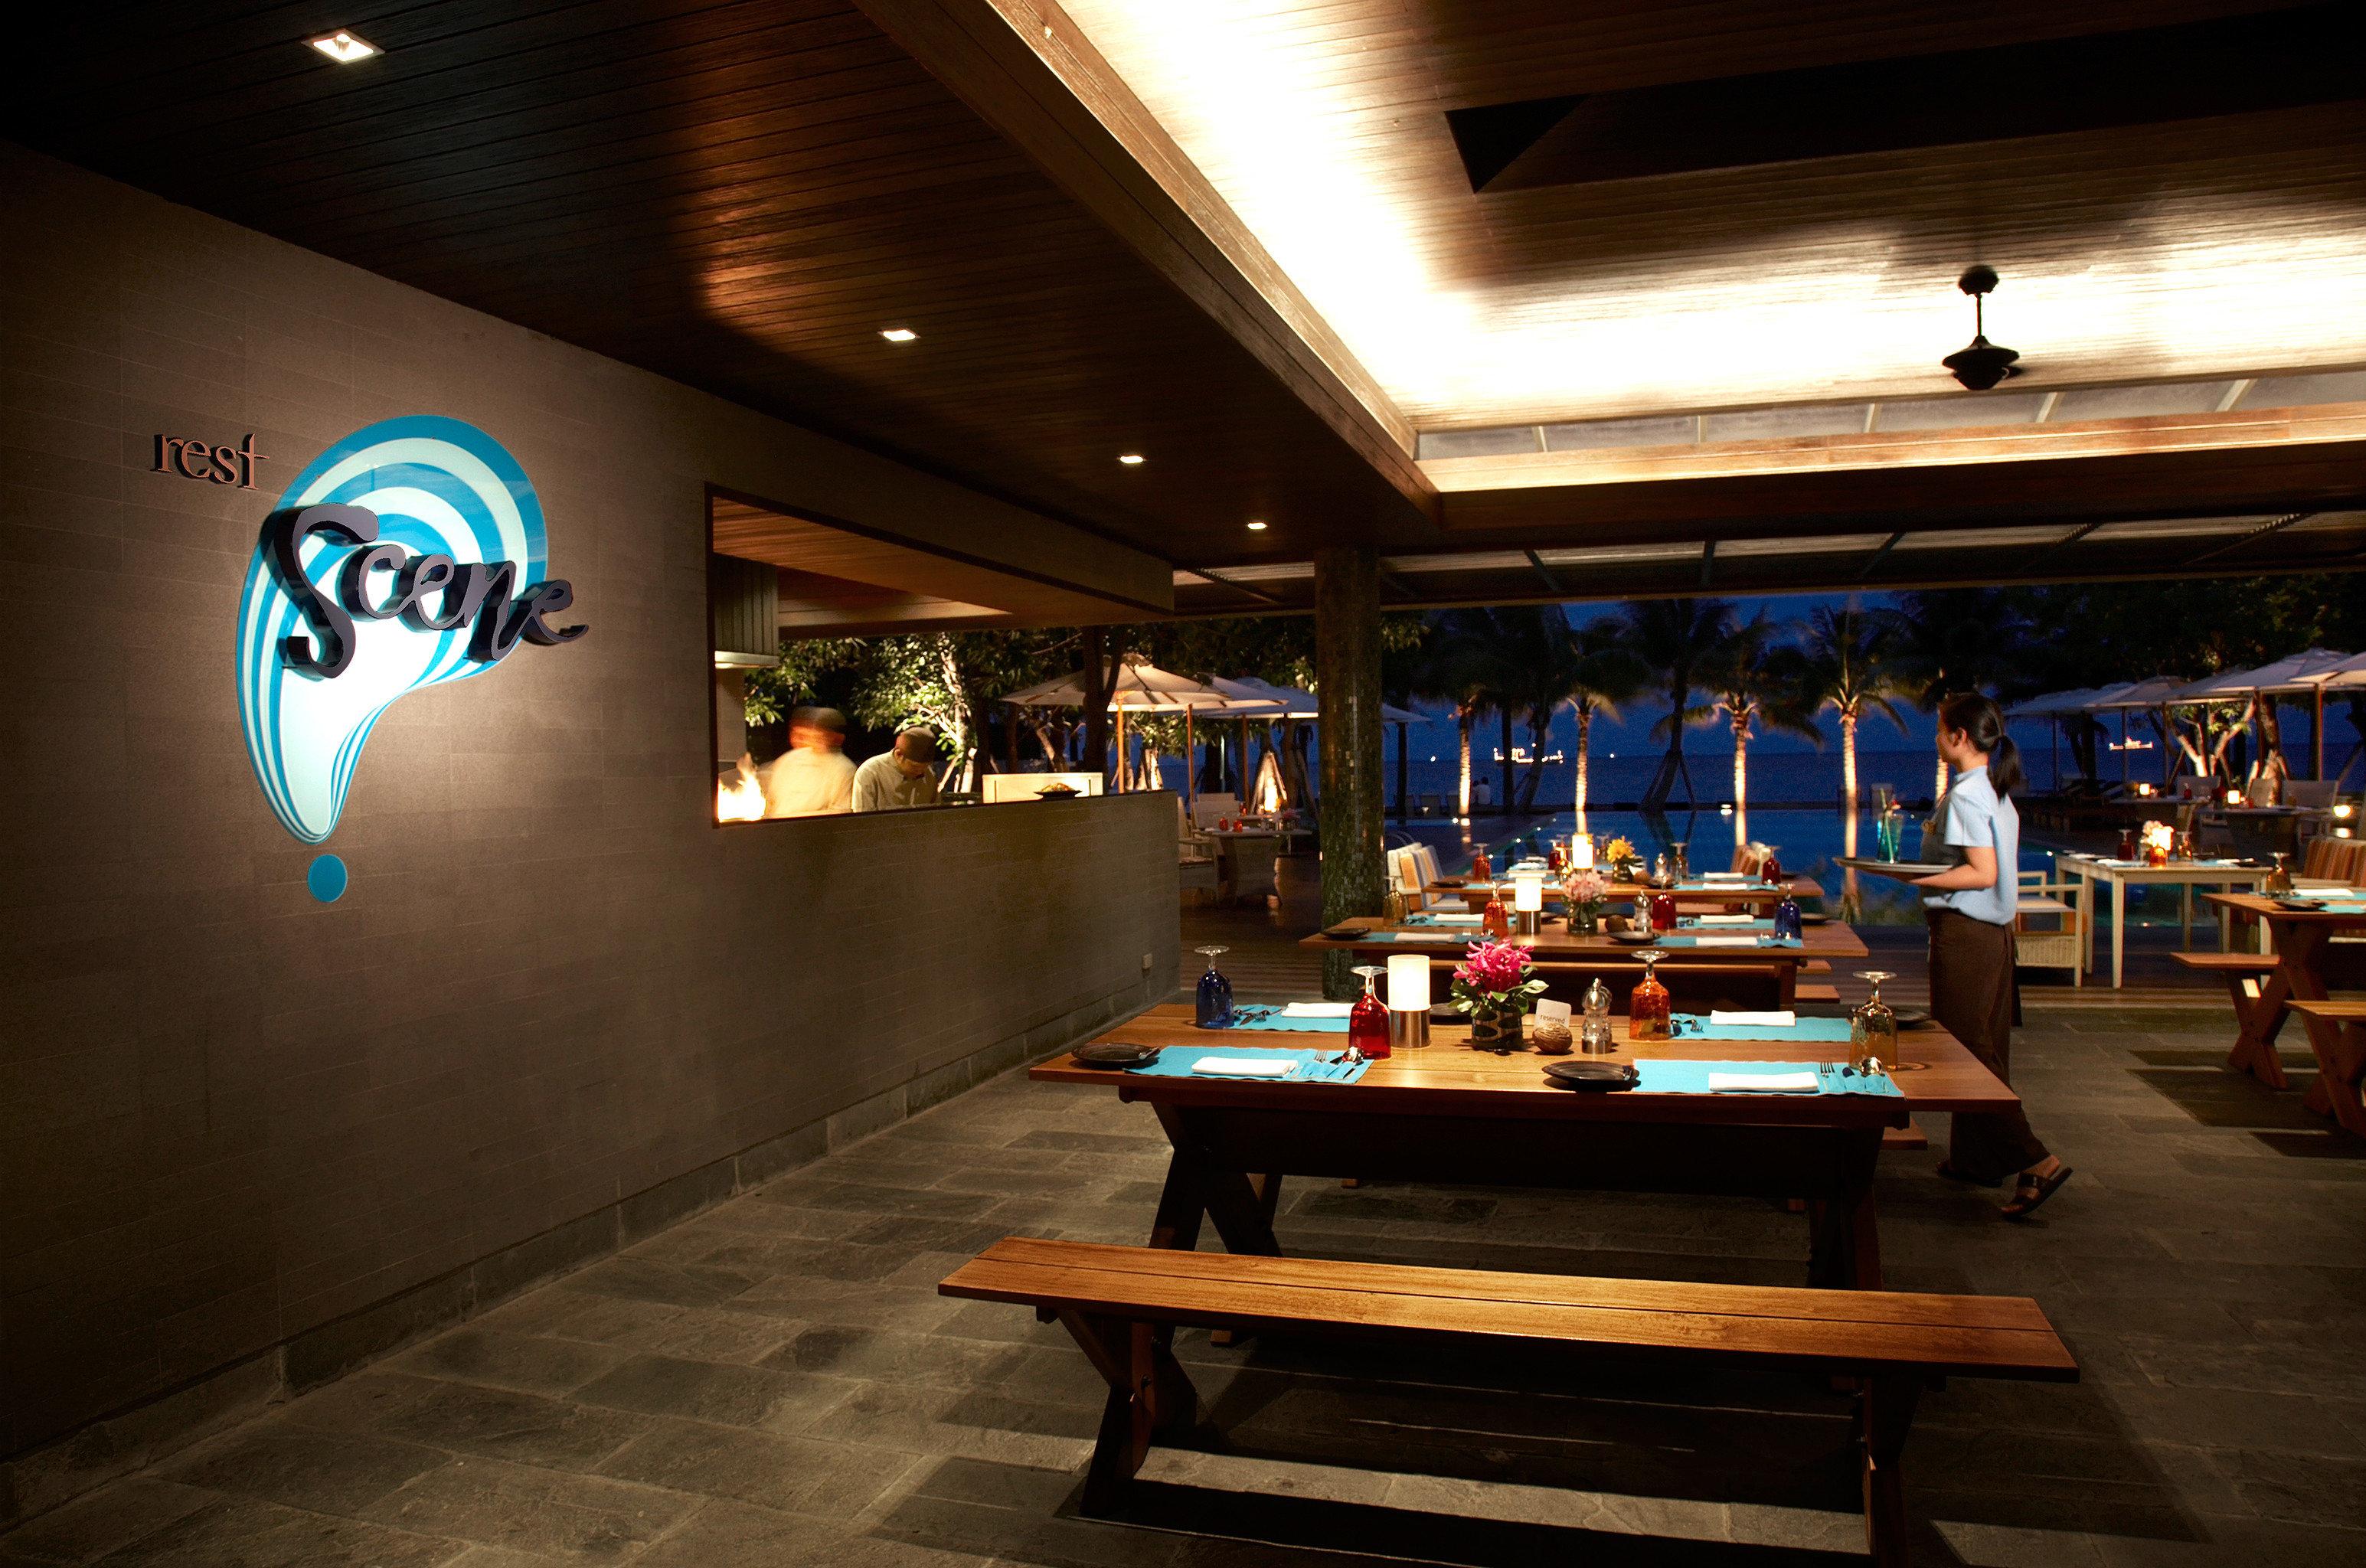 Beach Dining Drink Eat Patio Tropical night restaurant